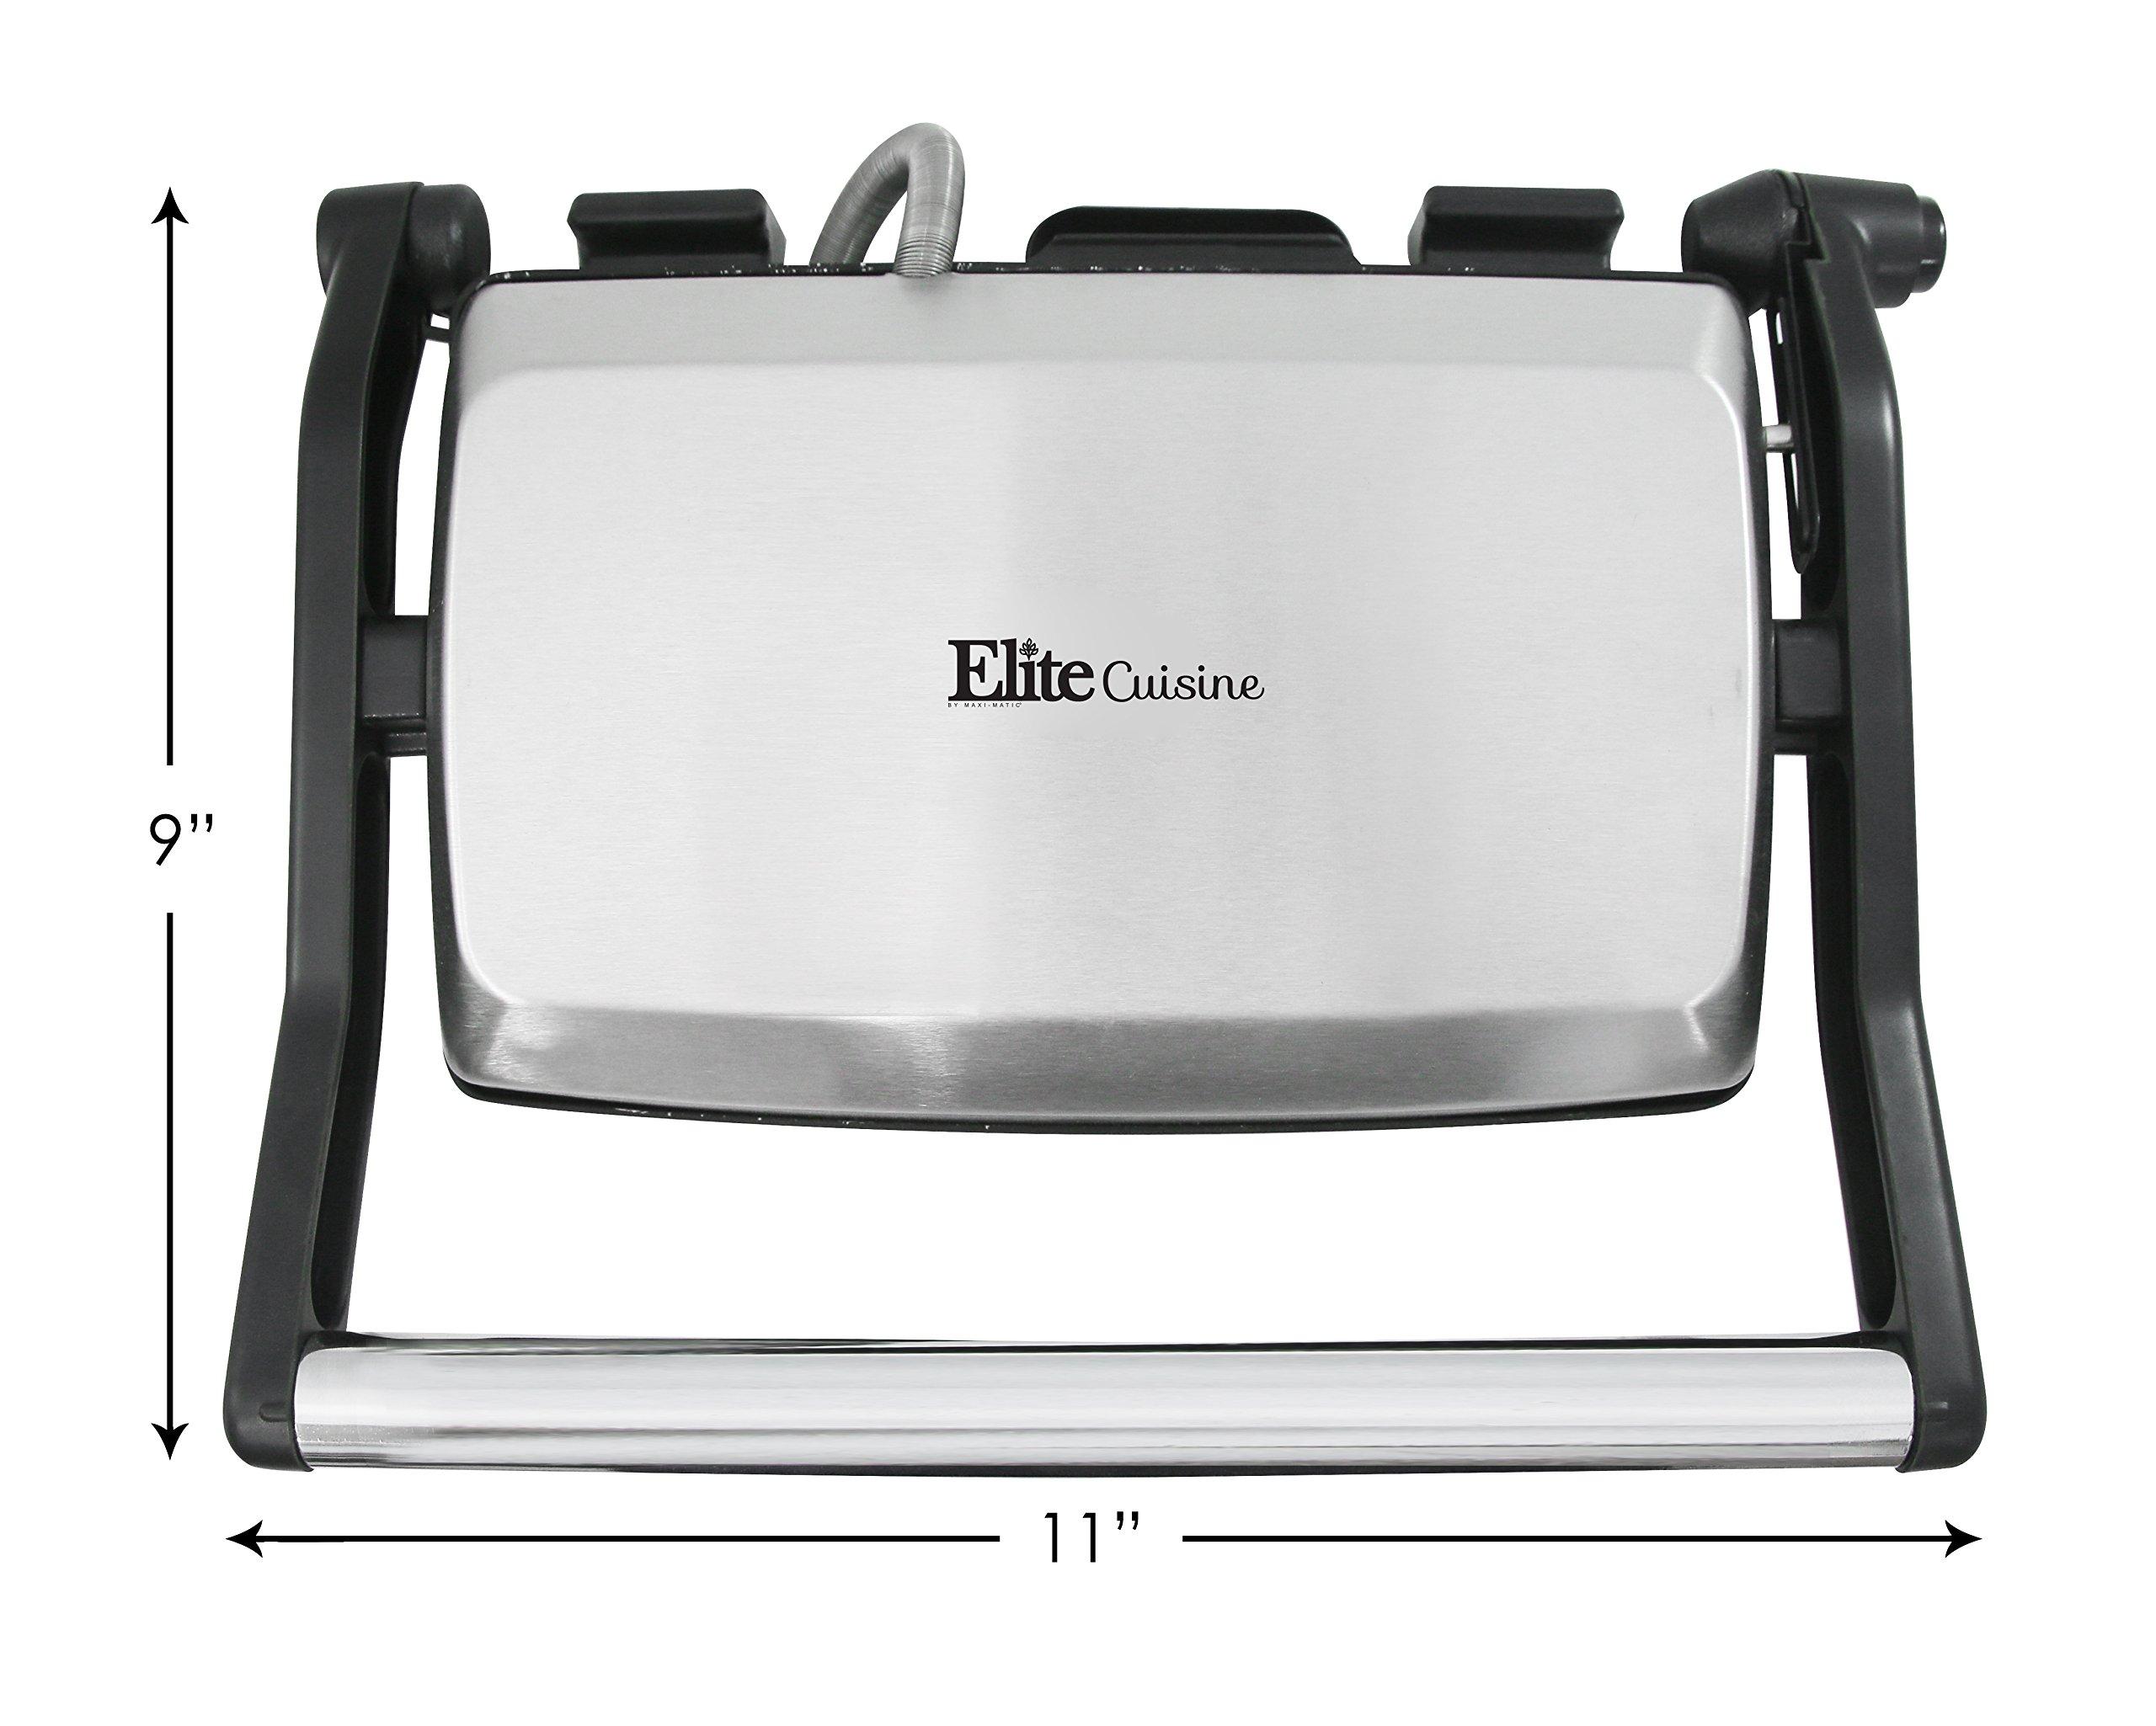 Elite Cuisine EPN-2976 Maxi-Matic Panini 180 Degree Indoor Contact Grill, Black